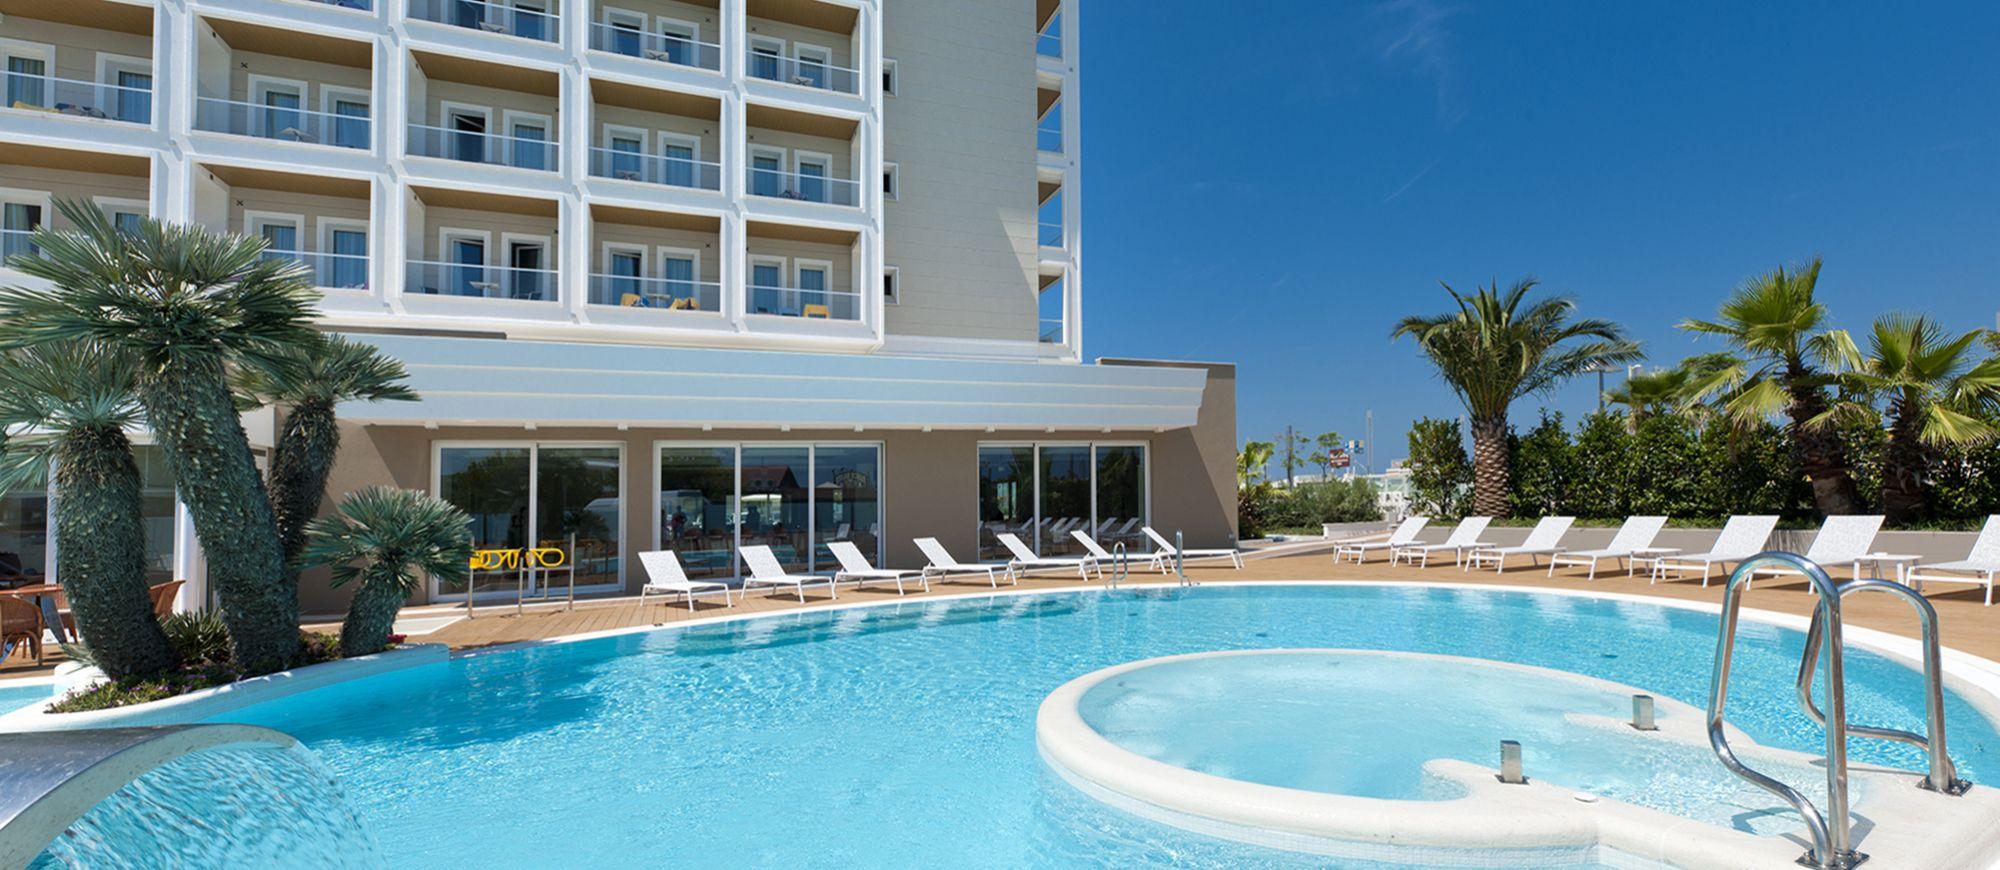 Hotel piscina coperta riccione hotel a riccione con - Hotel con piscina coperta e riscaldata ...